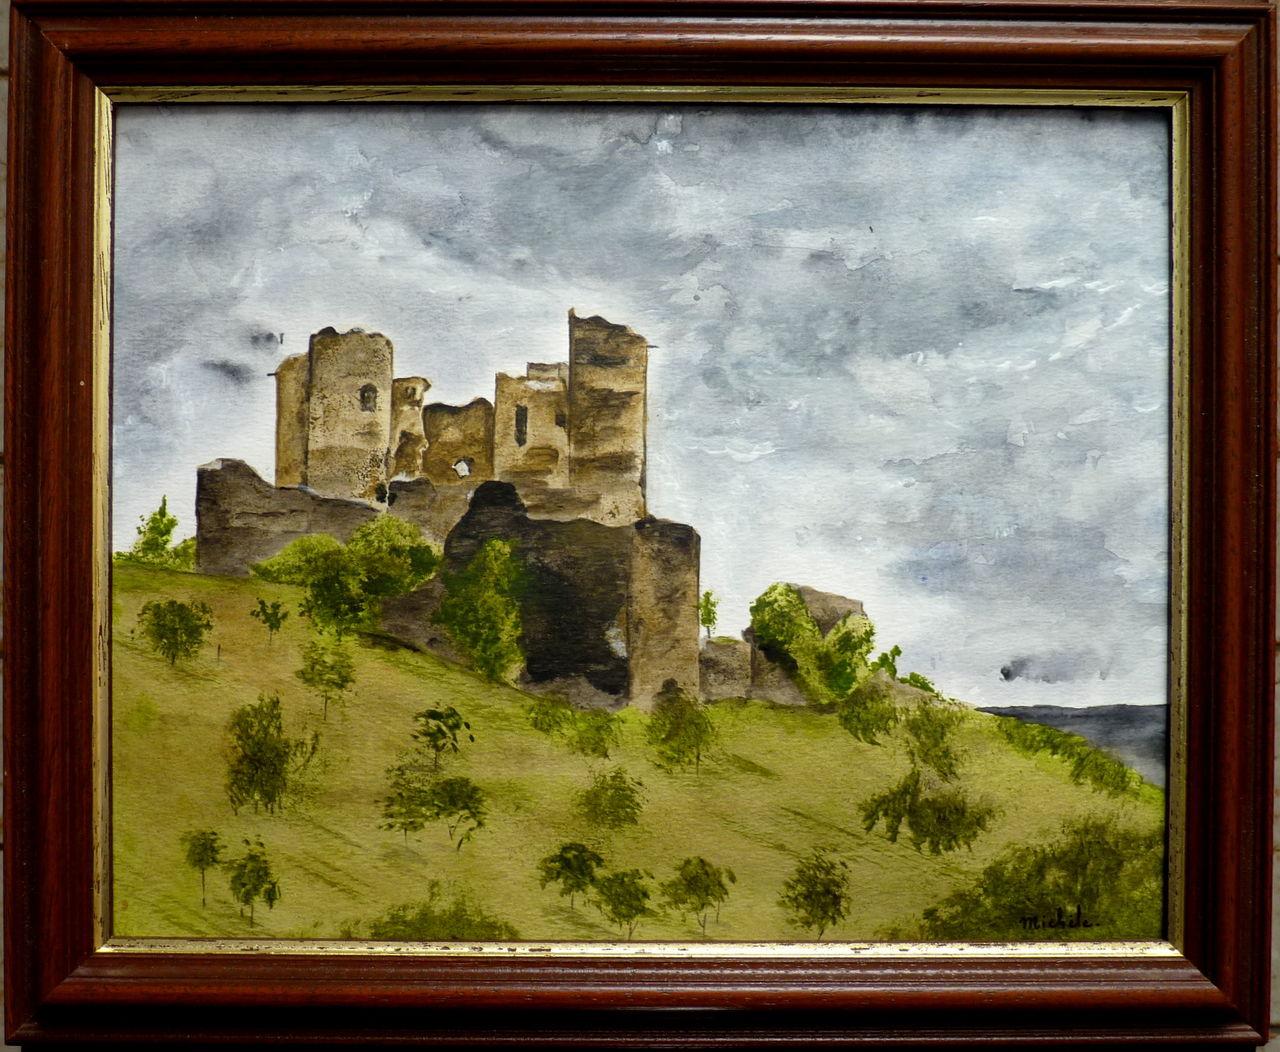 Michele martin Chateau de Domeyrat.